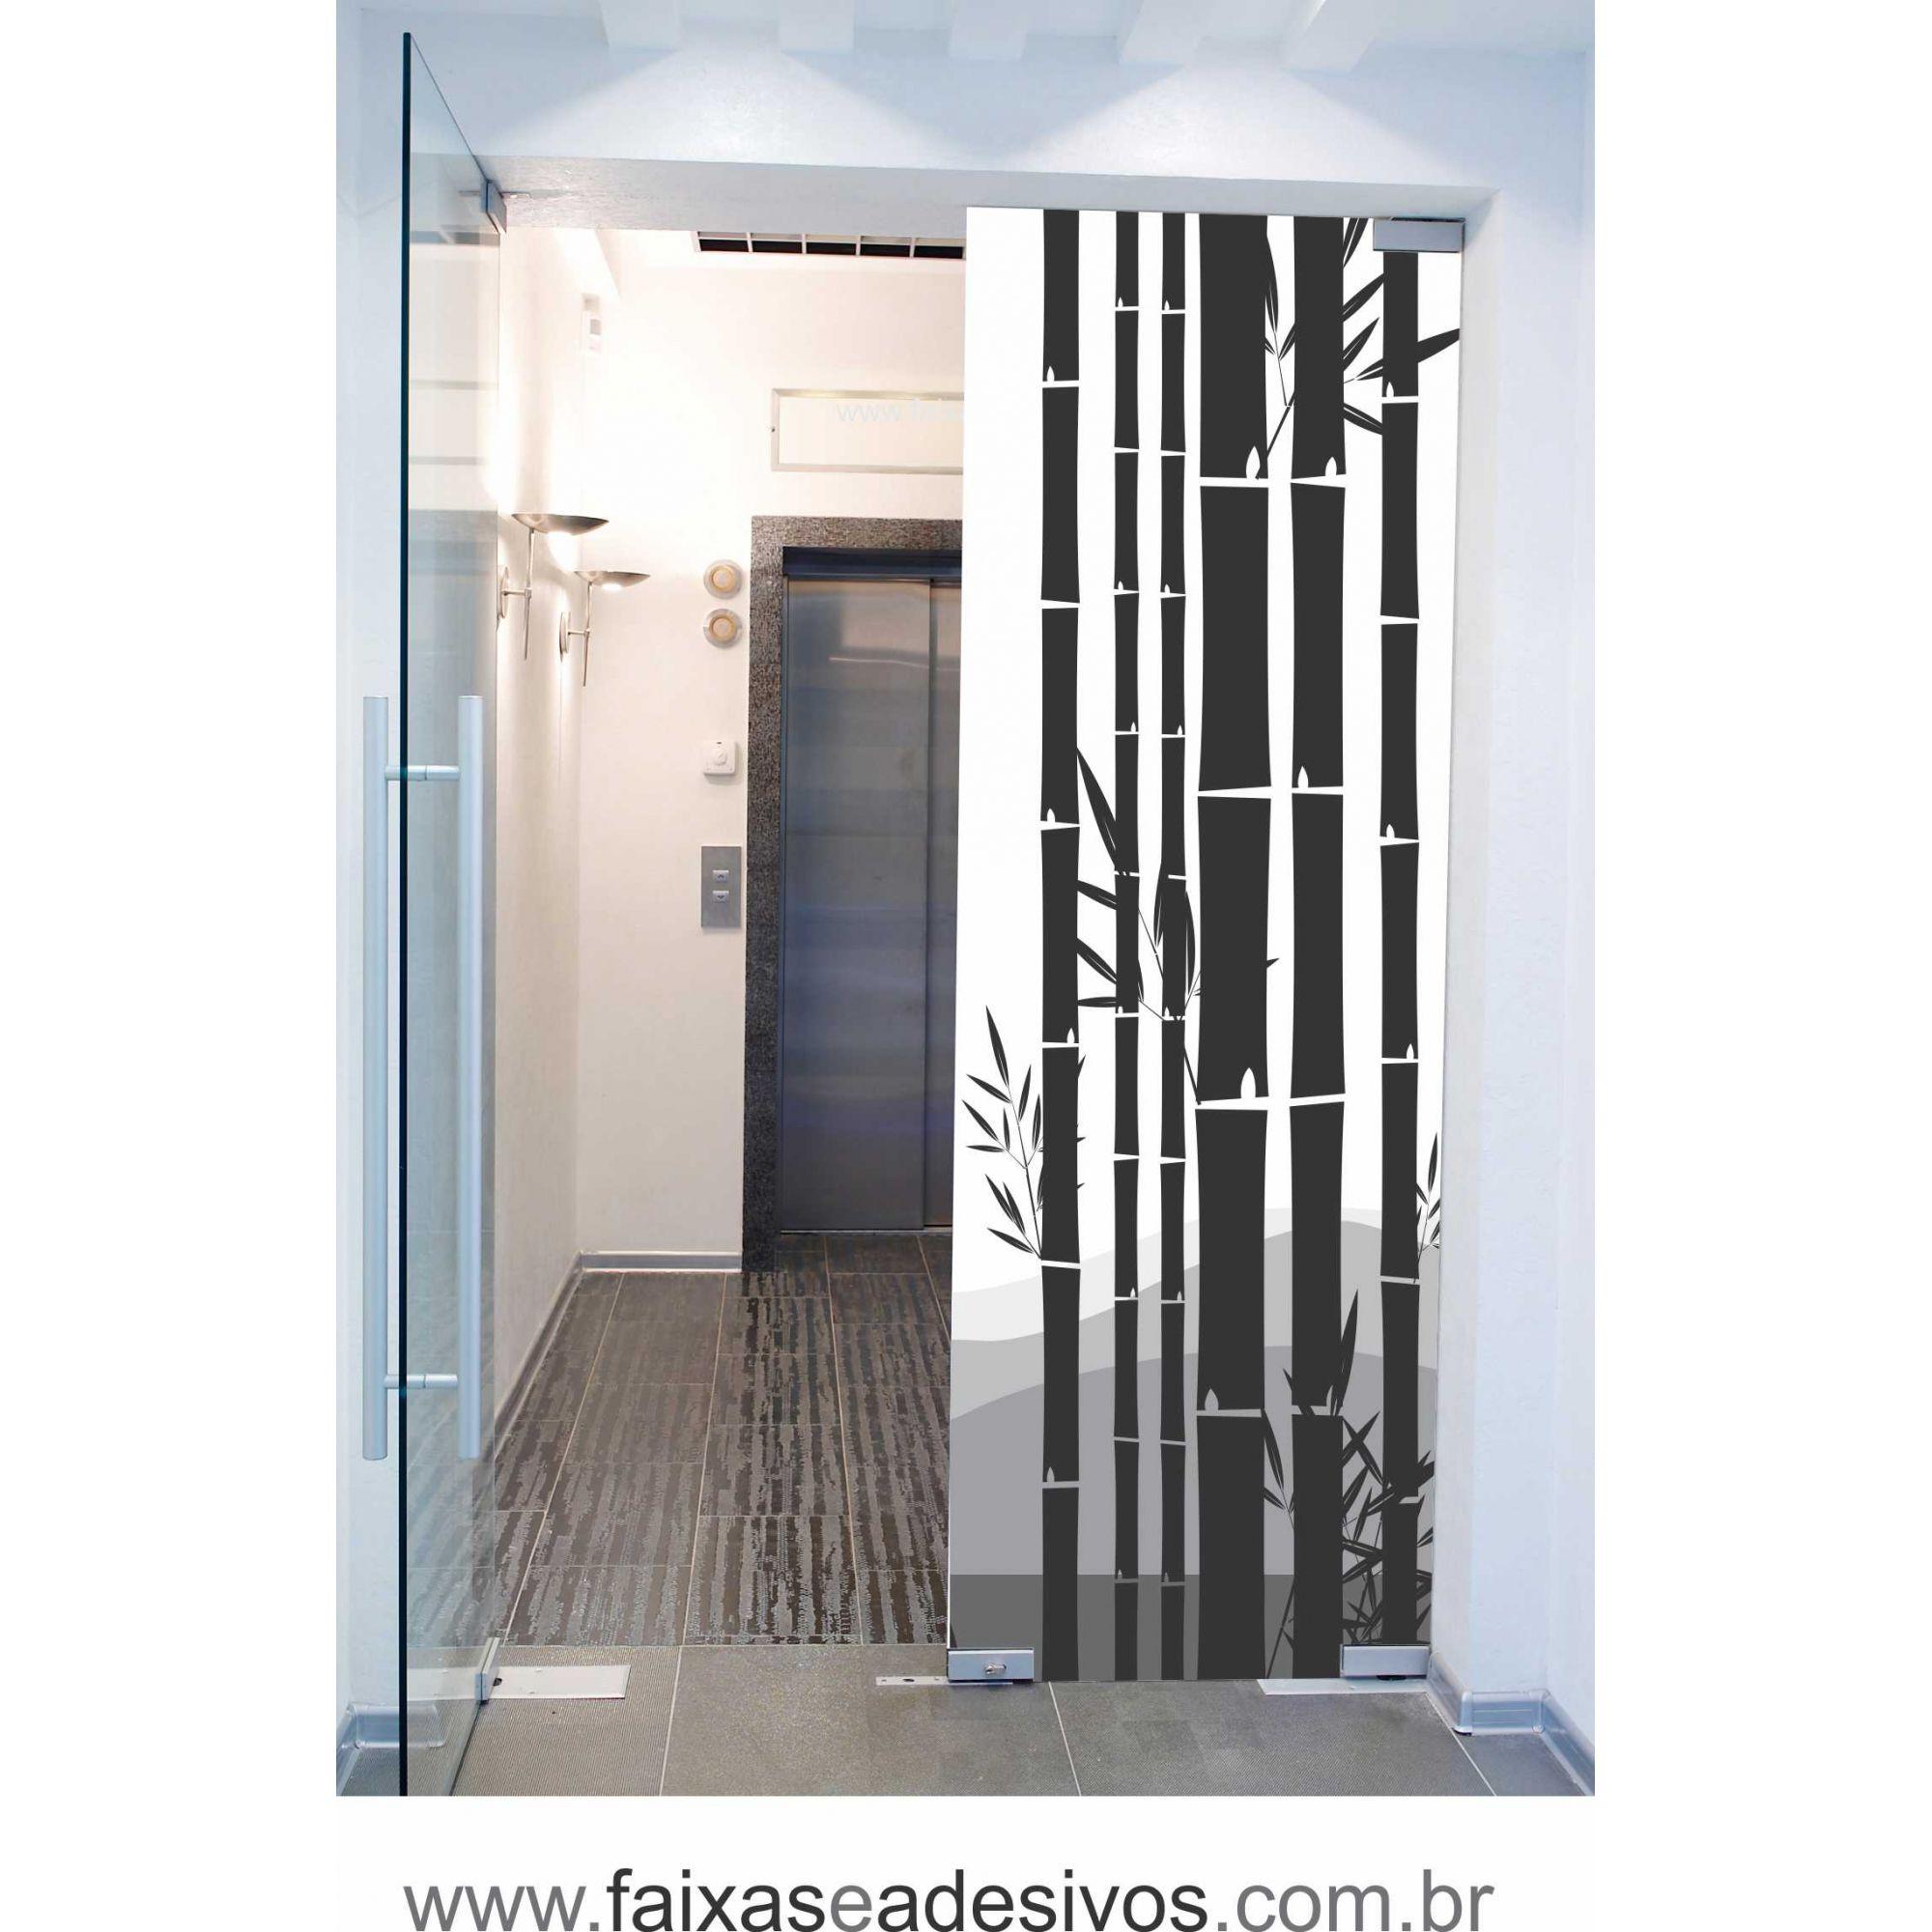 062 VD - Adesivo Jateado para vidro Bambuzal  220x70cm  - FAC Signs Impressão Digital